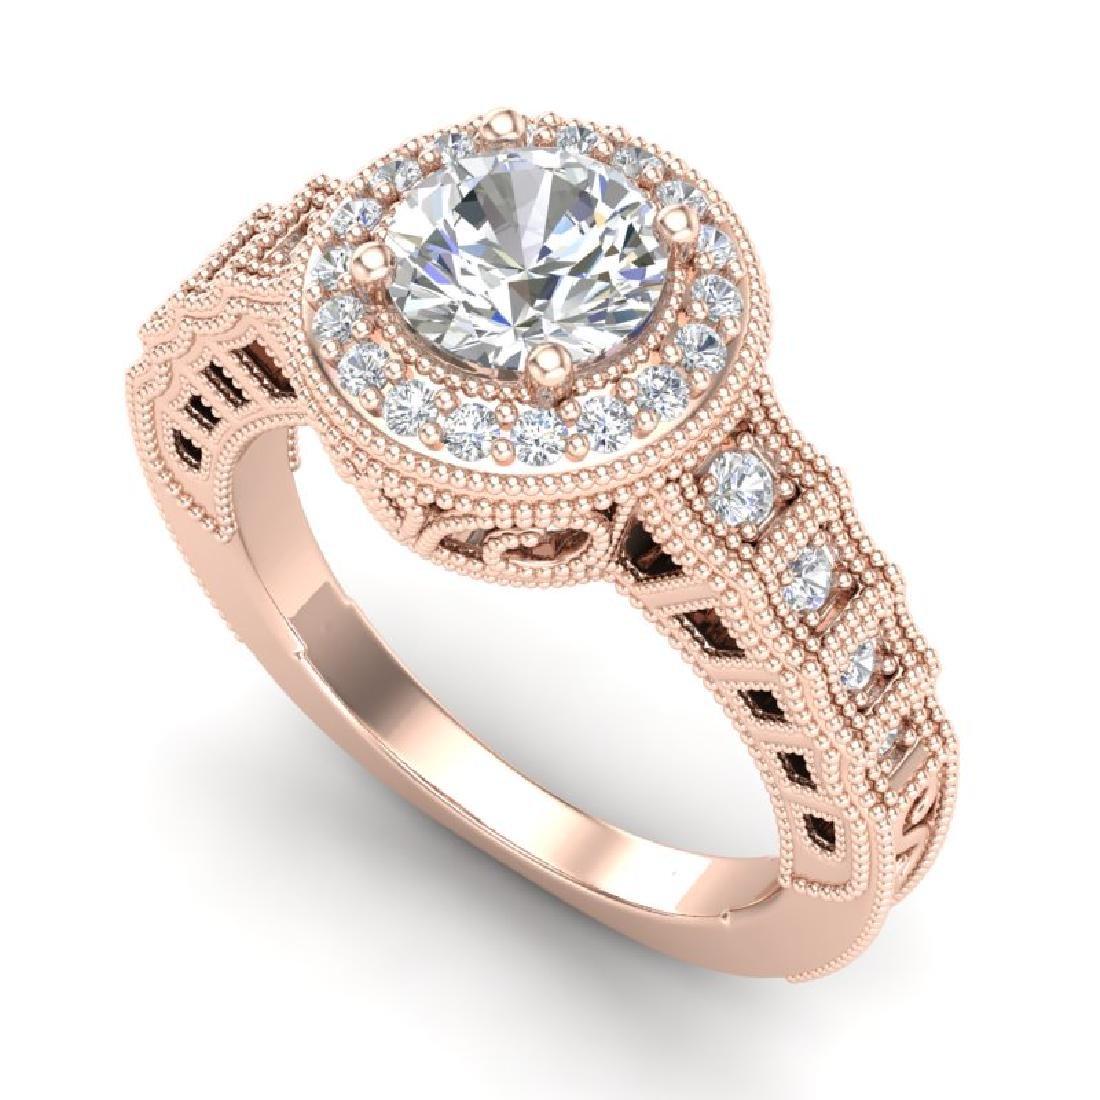 1.53 CTW VS/SI Diamond Solitaire Art Deco Ring 18K Rose